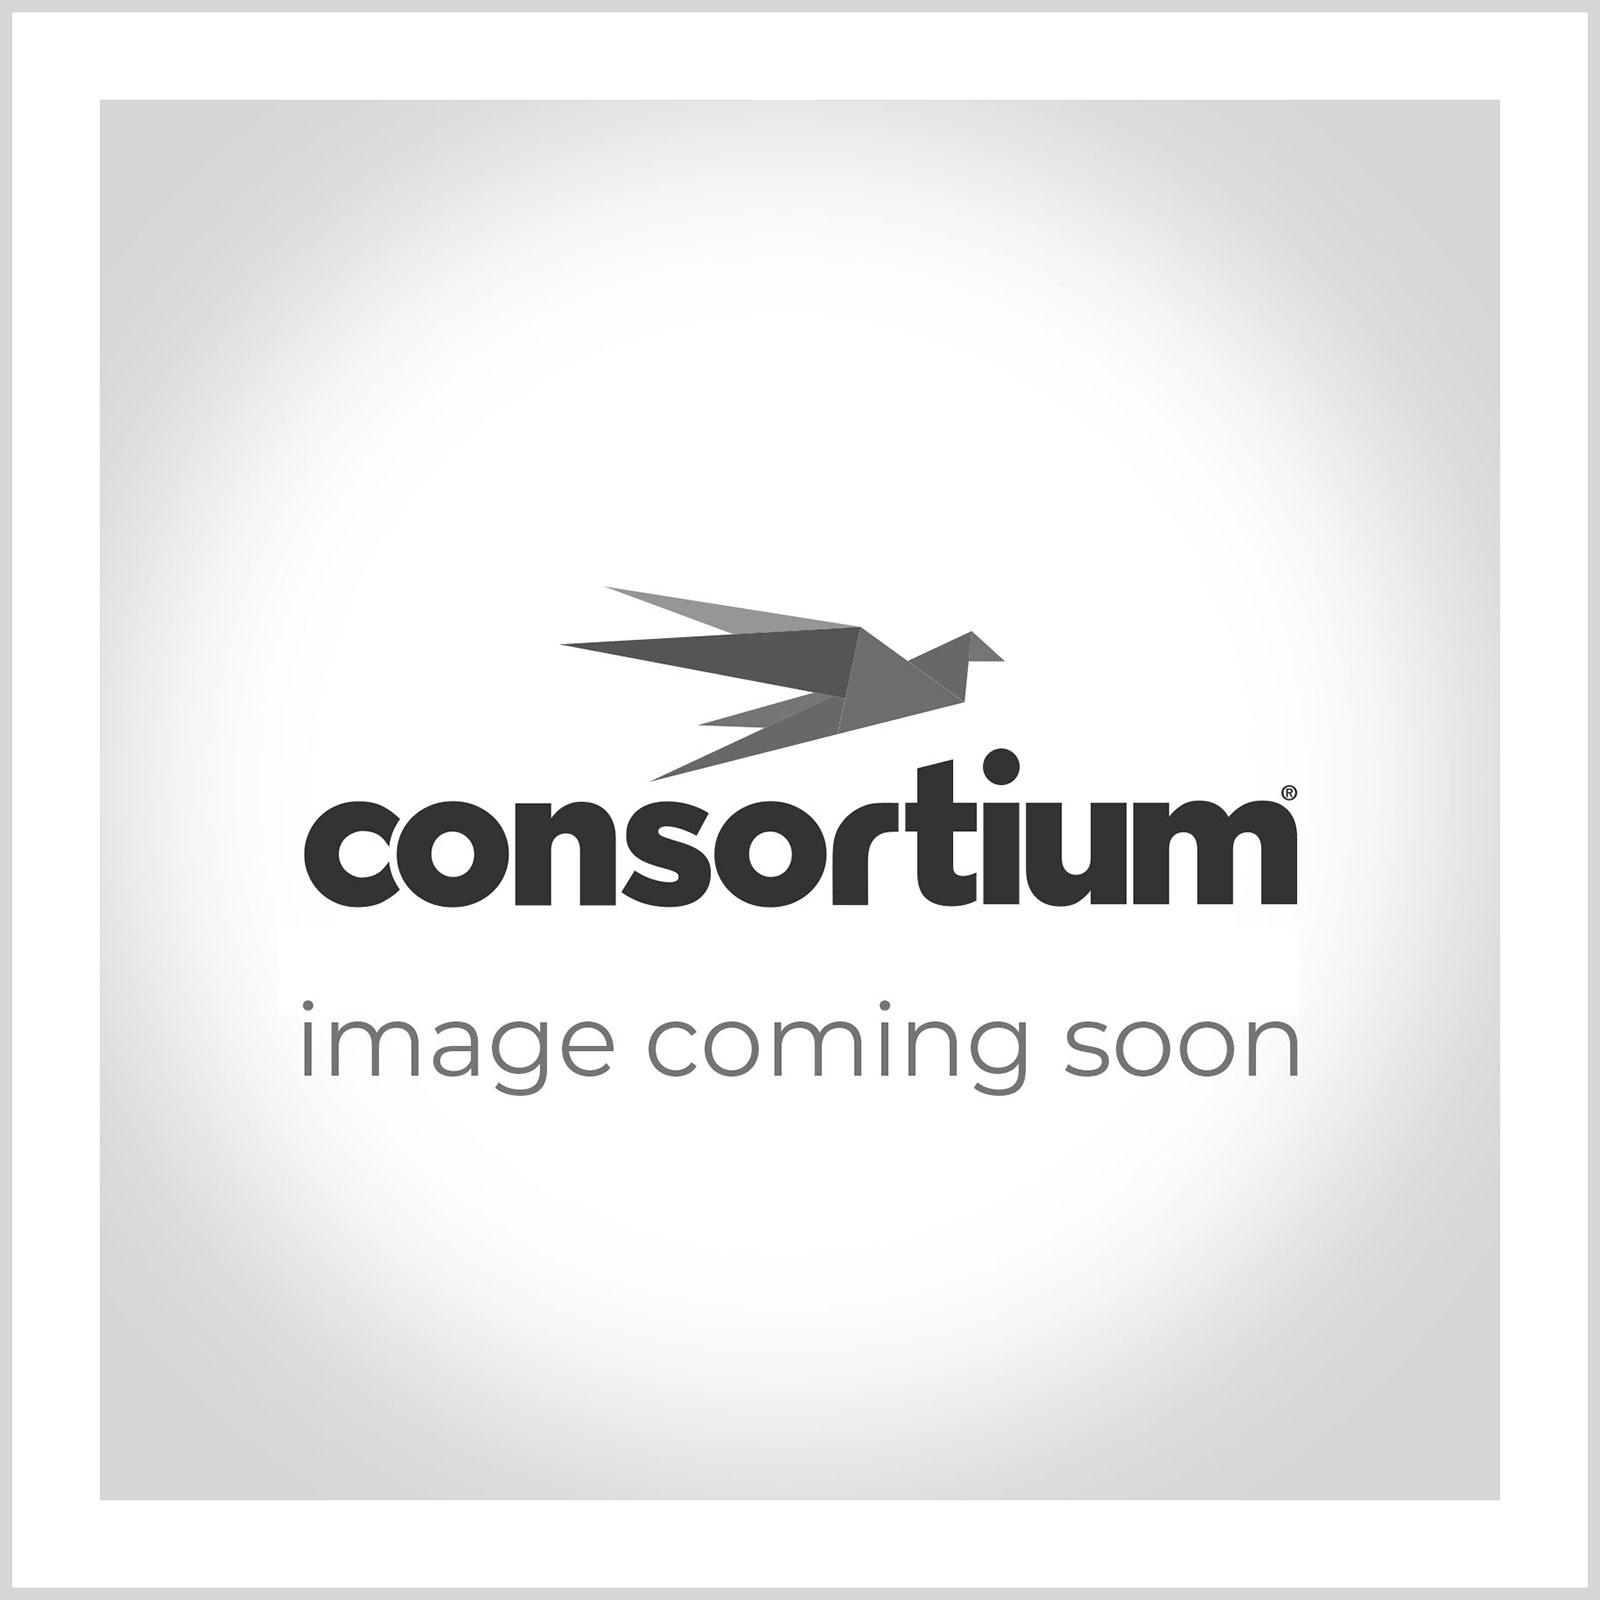 3 Blade Propeller